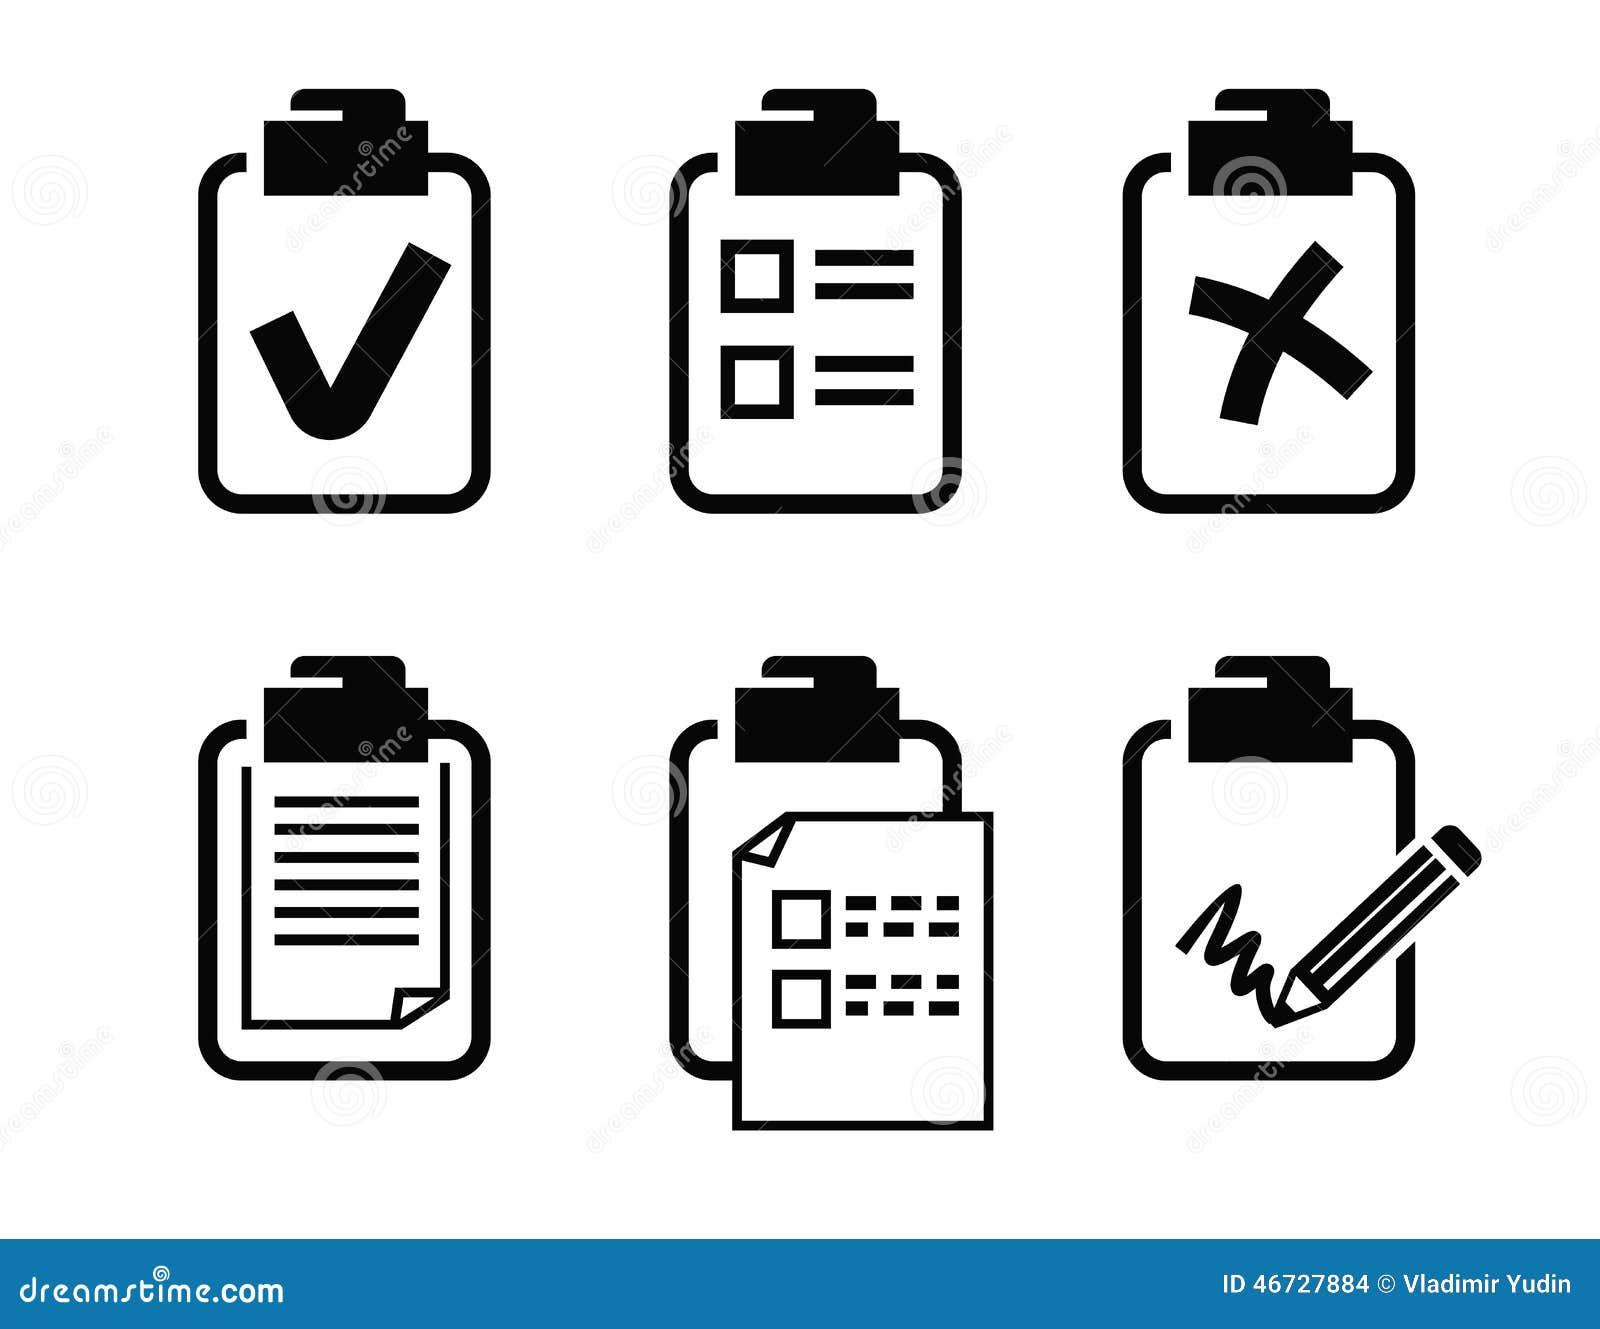 clipboard icon stock vector  illustration of clip  icon